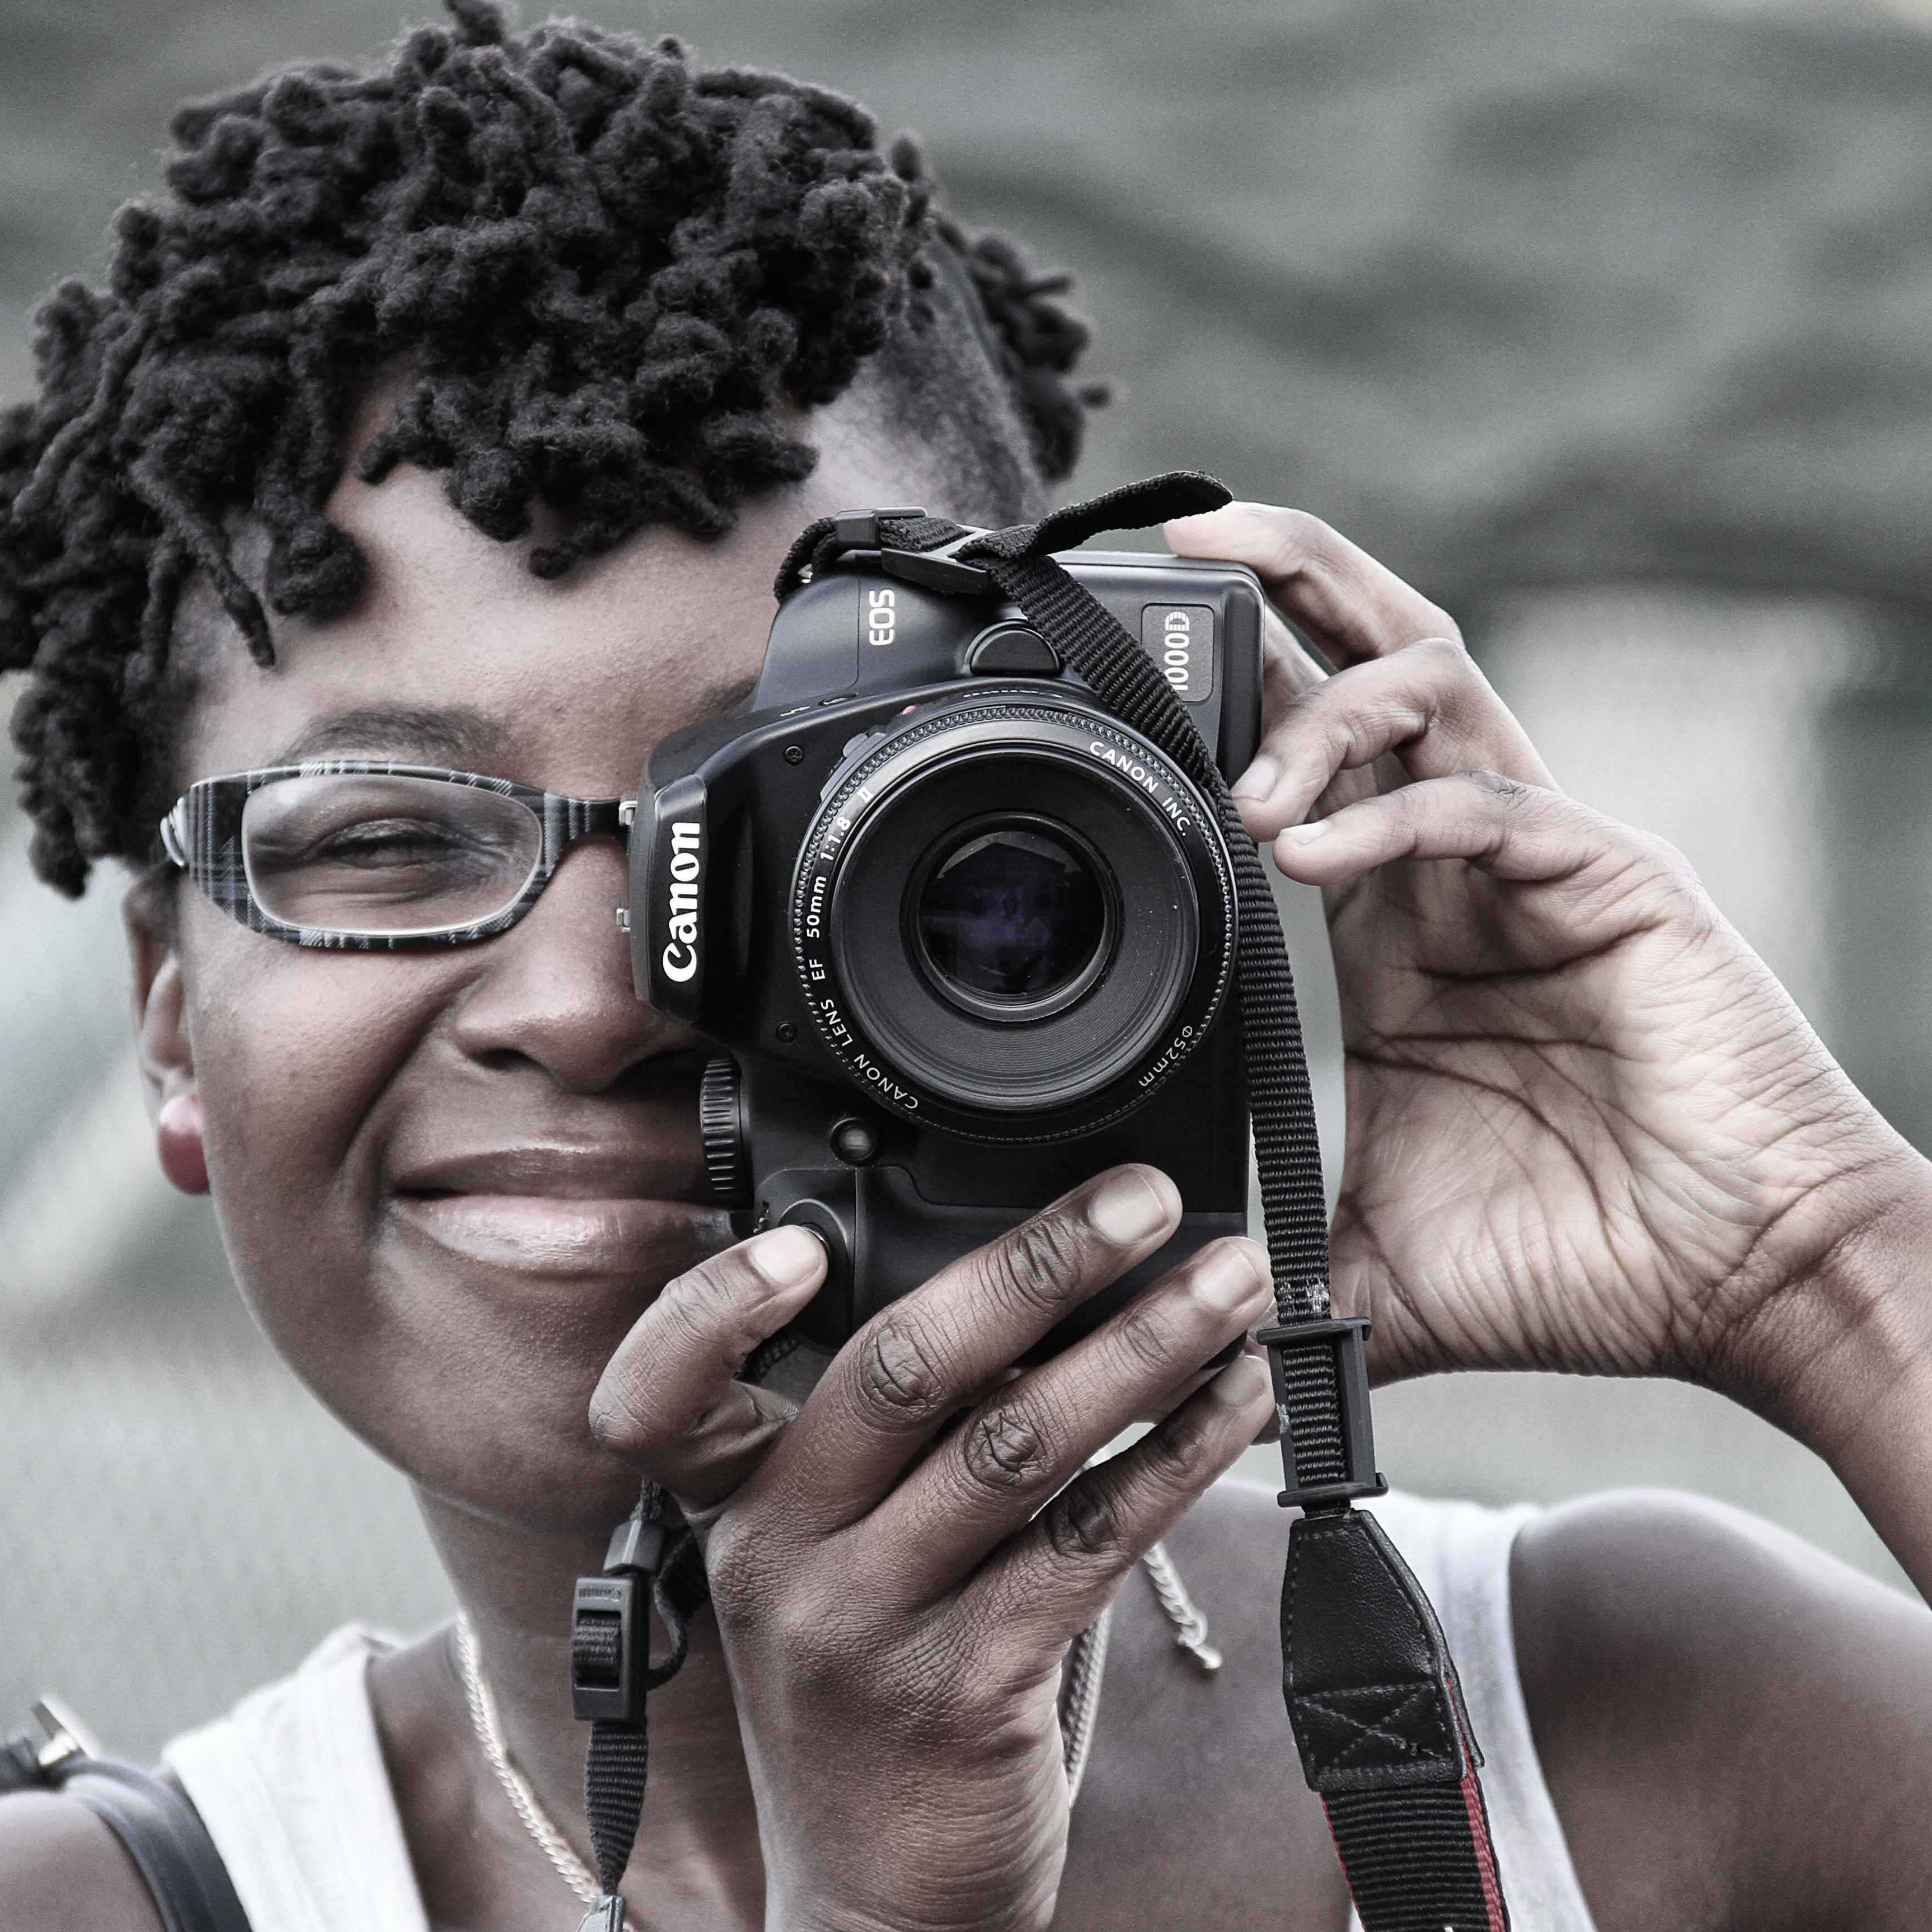 Lufuno Claire Sathekge